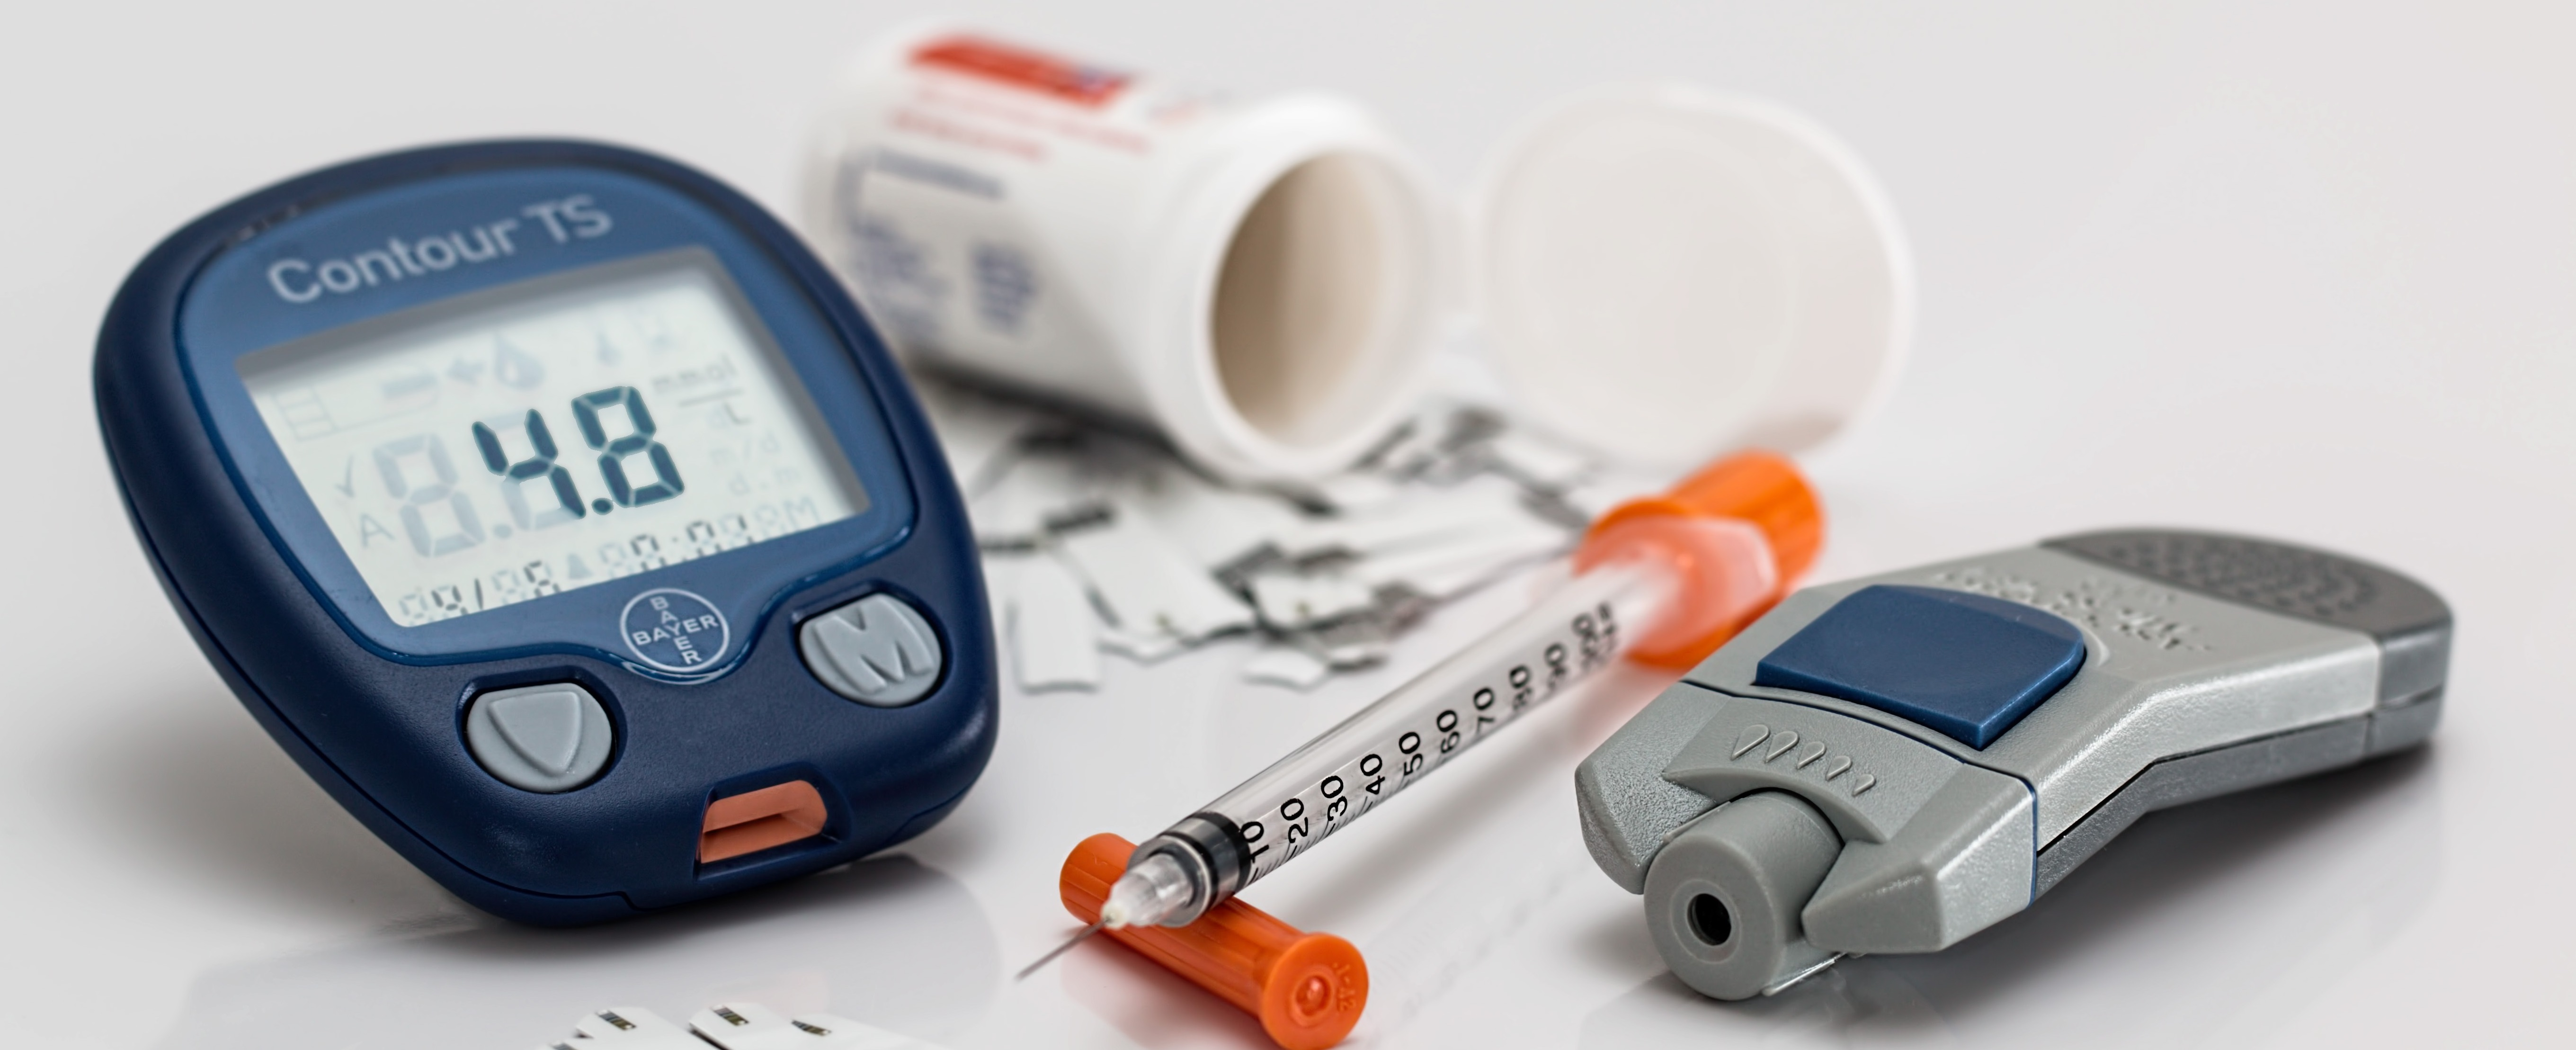 diabetes blood sugar medicine and tools